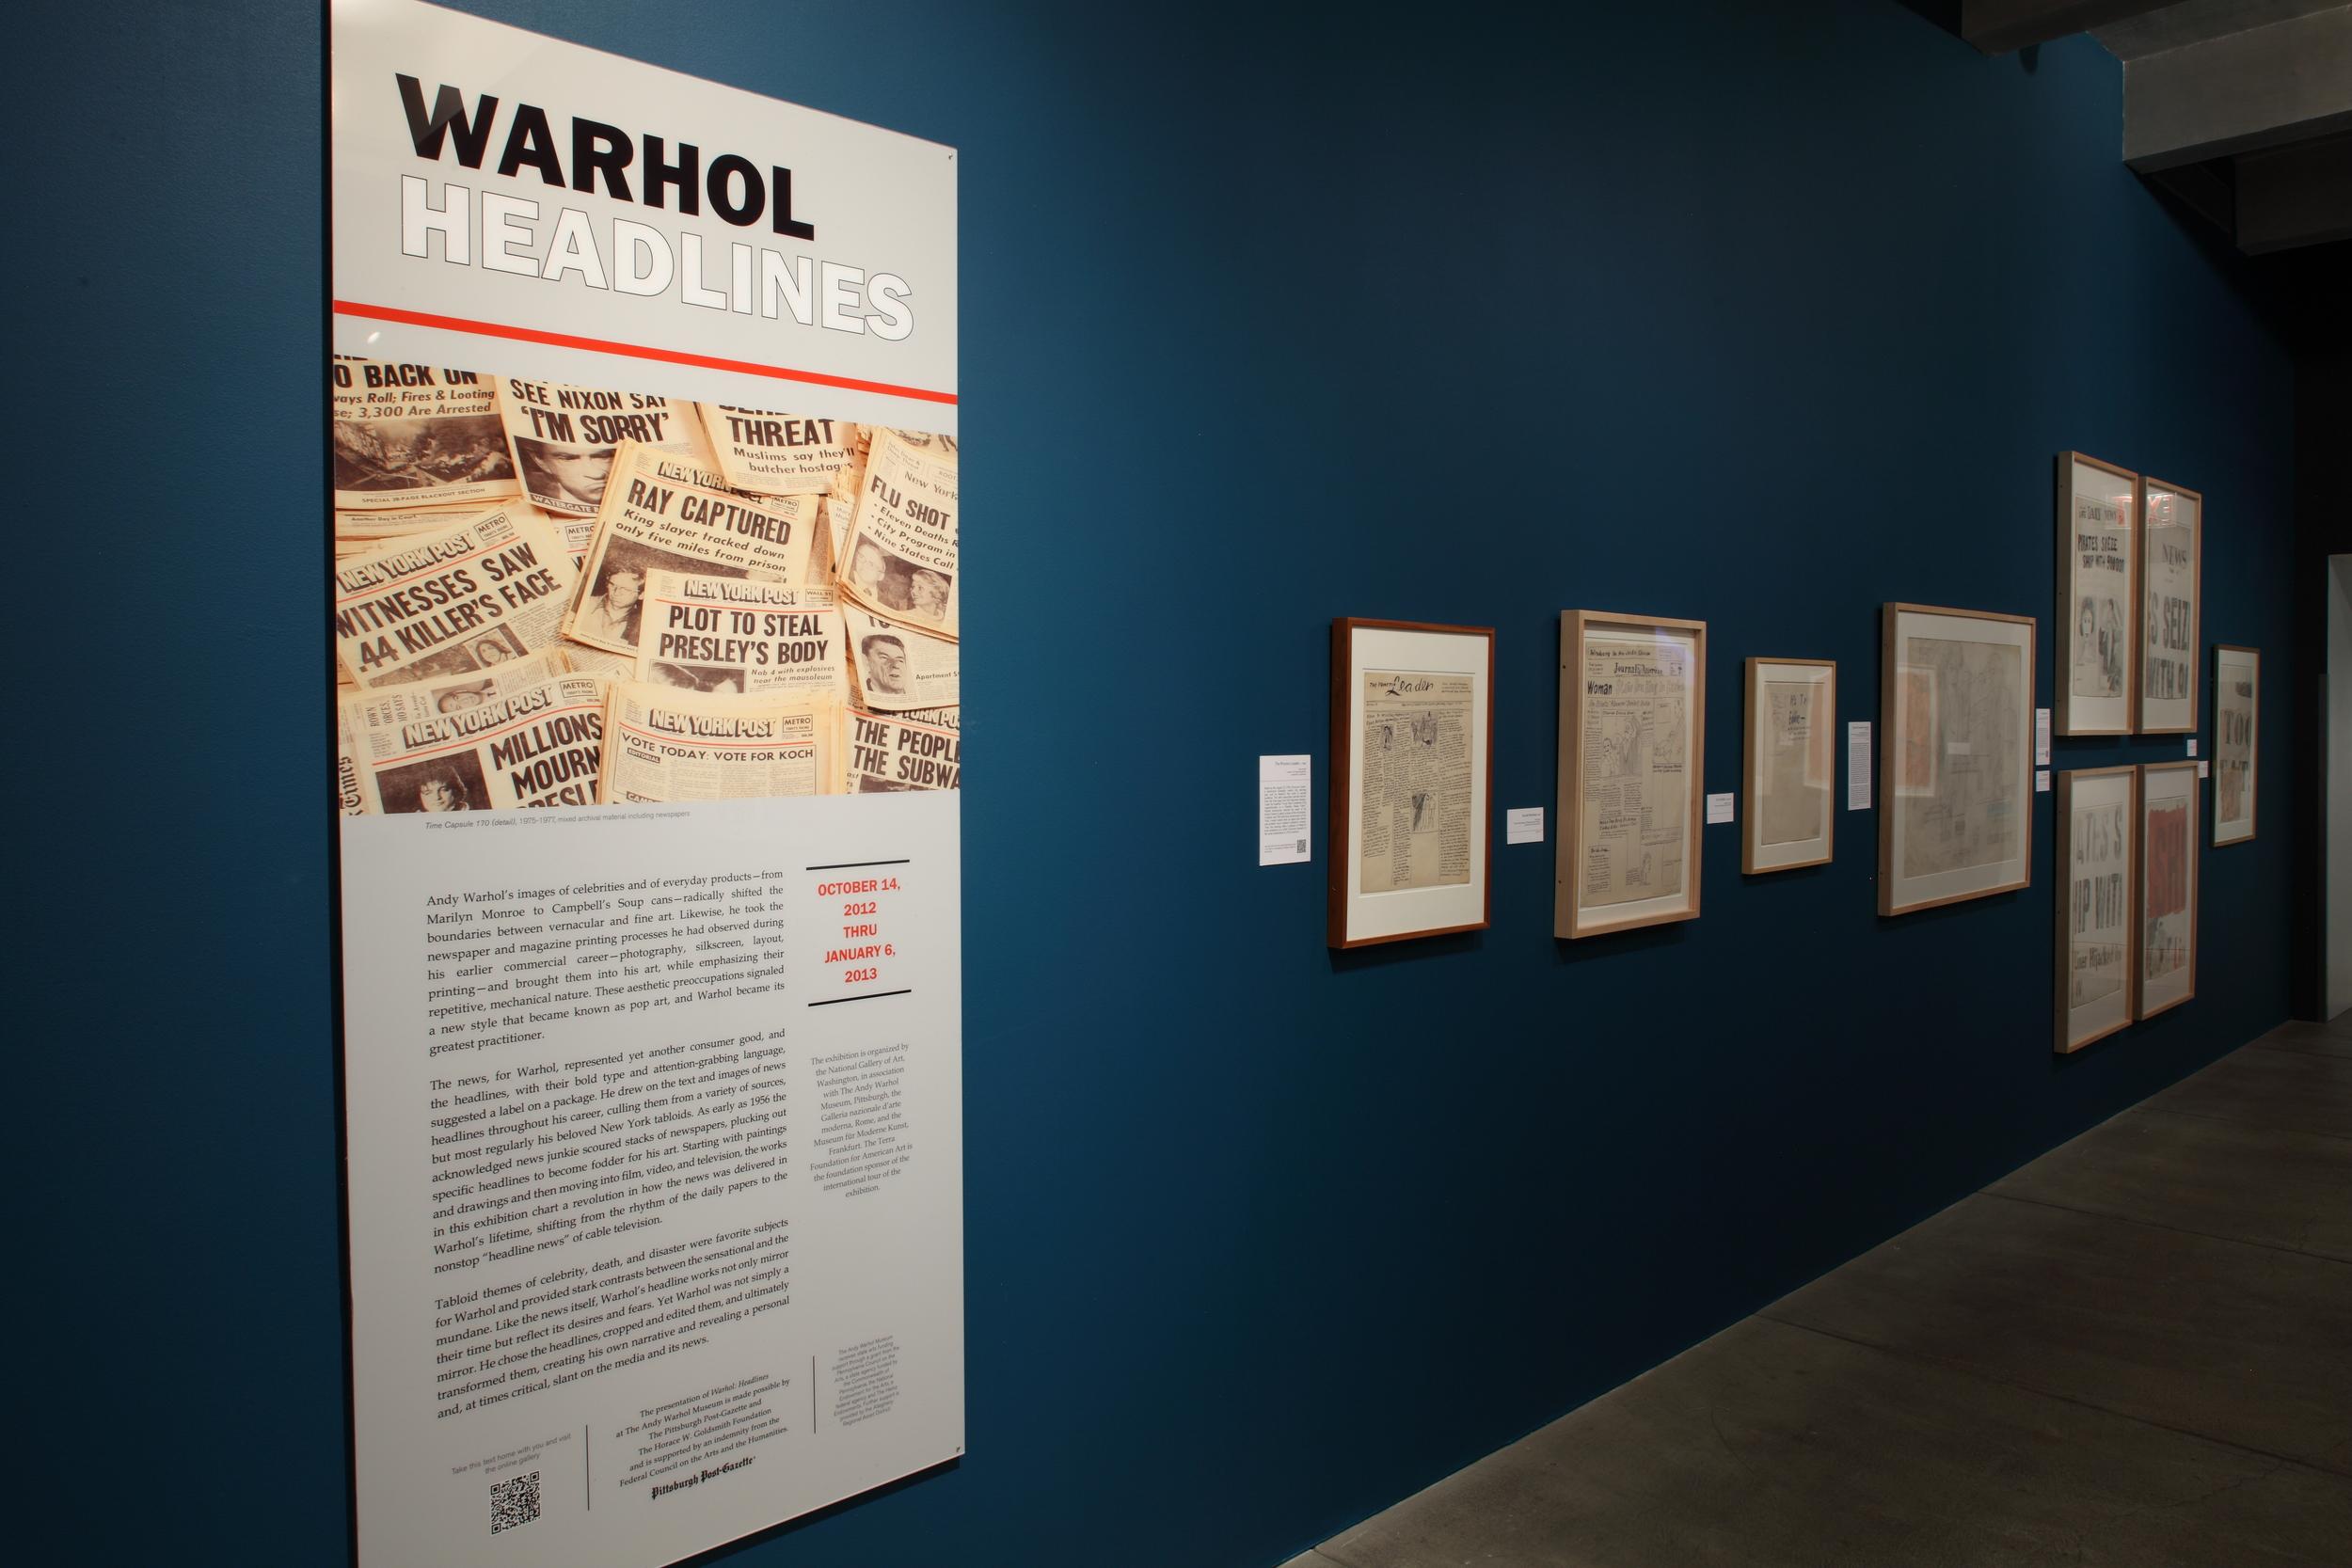 Warhol - Headlines at The Andy Warhol Museum, 2012 0003.JPG